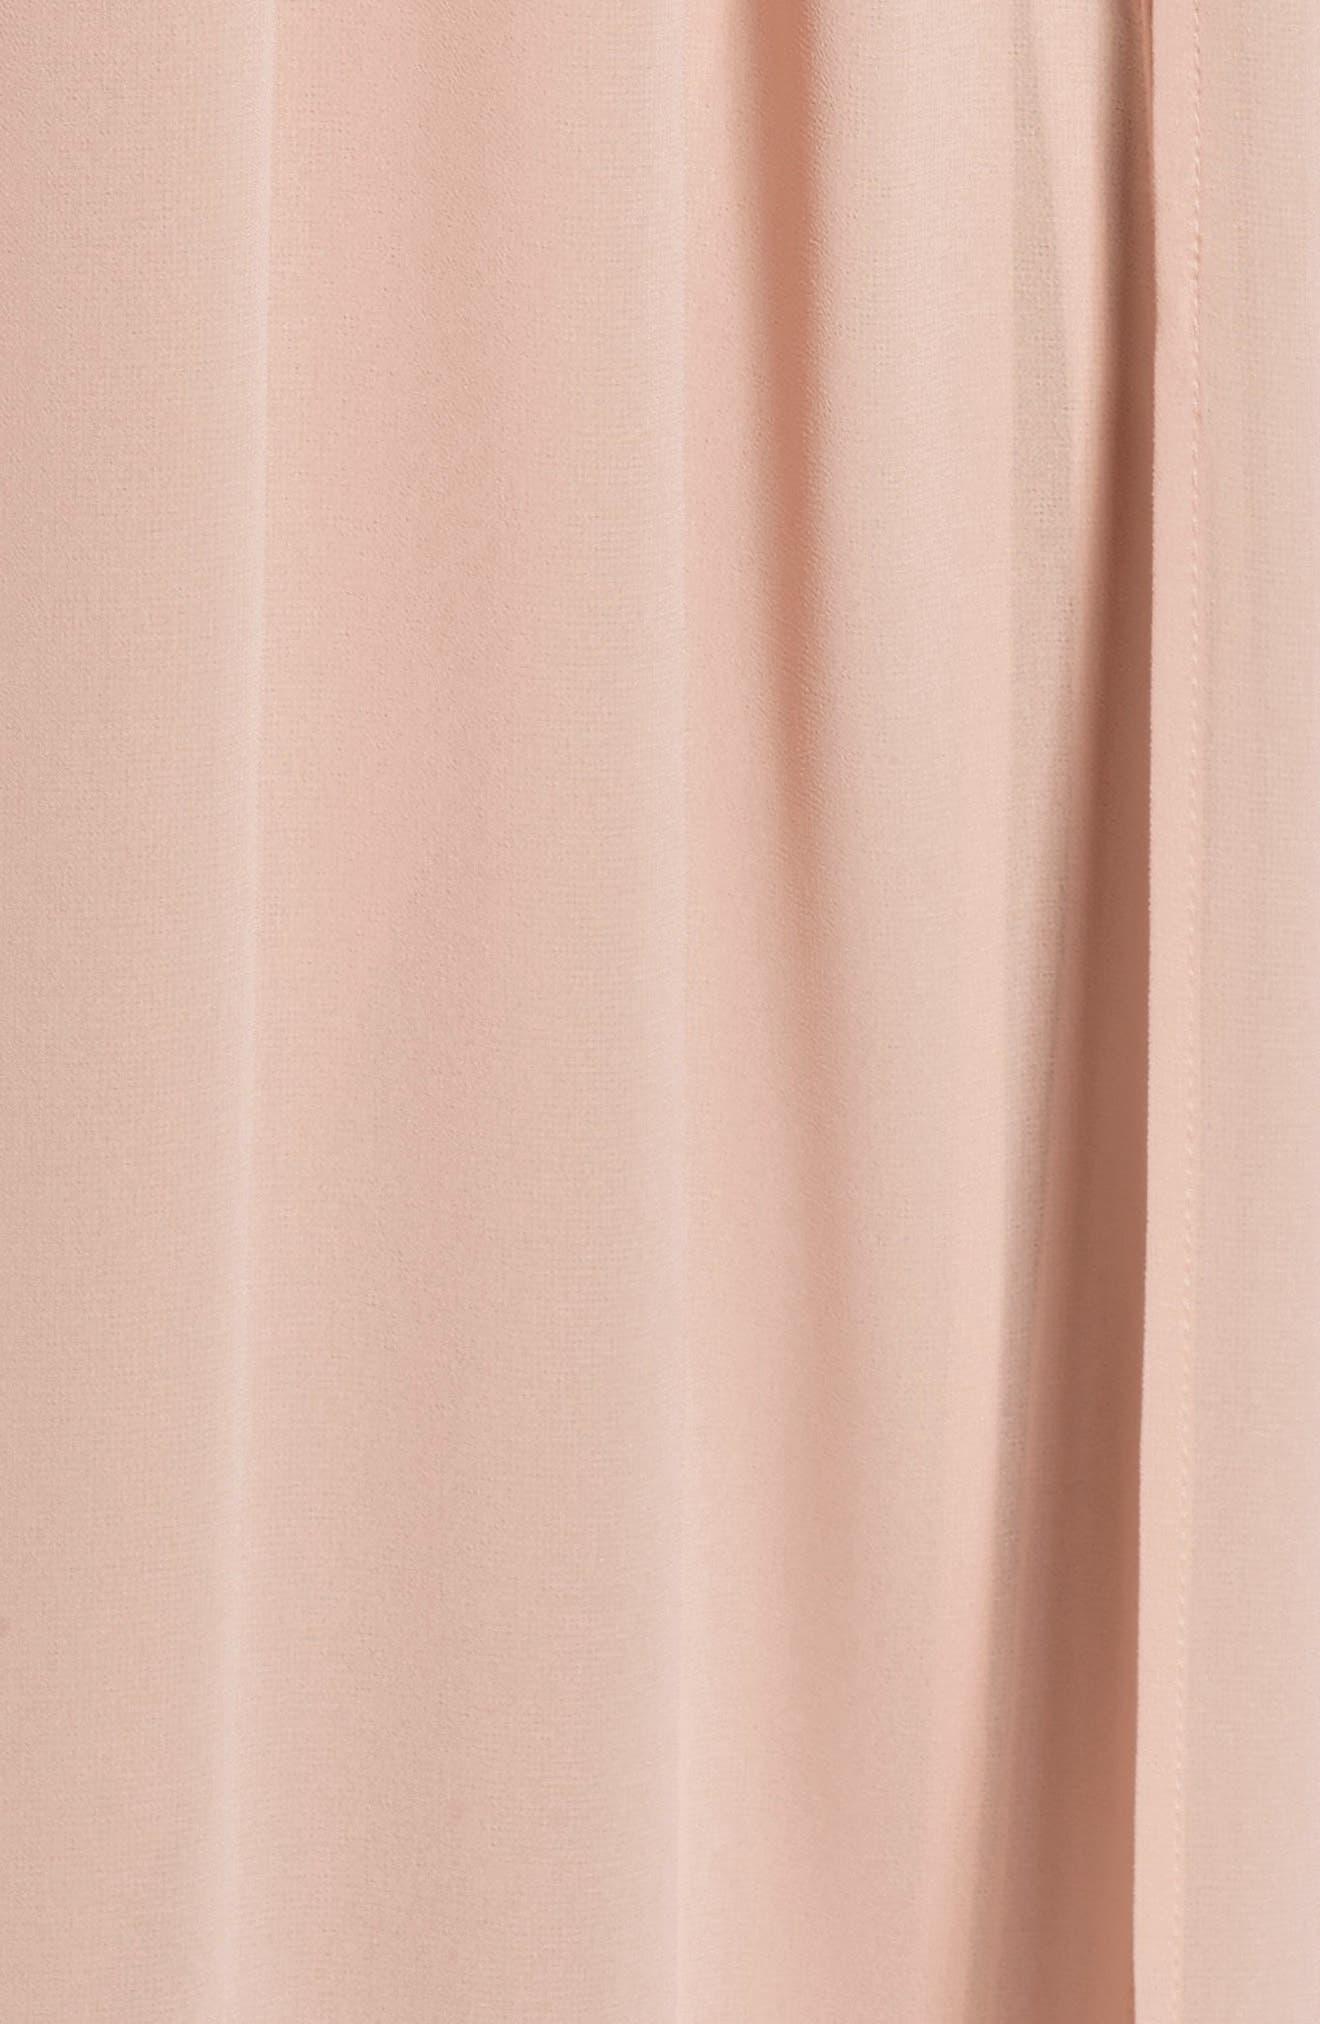 Plunging V-Neck Chiffon Gown,                             Alternate thumbnail 7, color,                             BLUSH